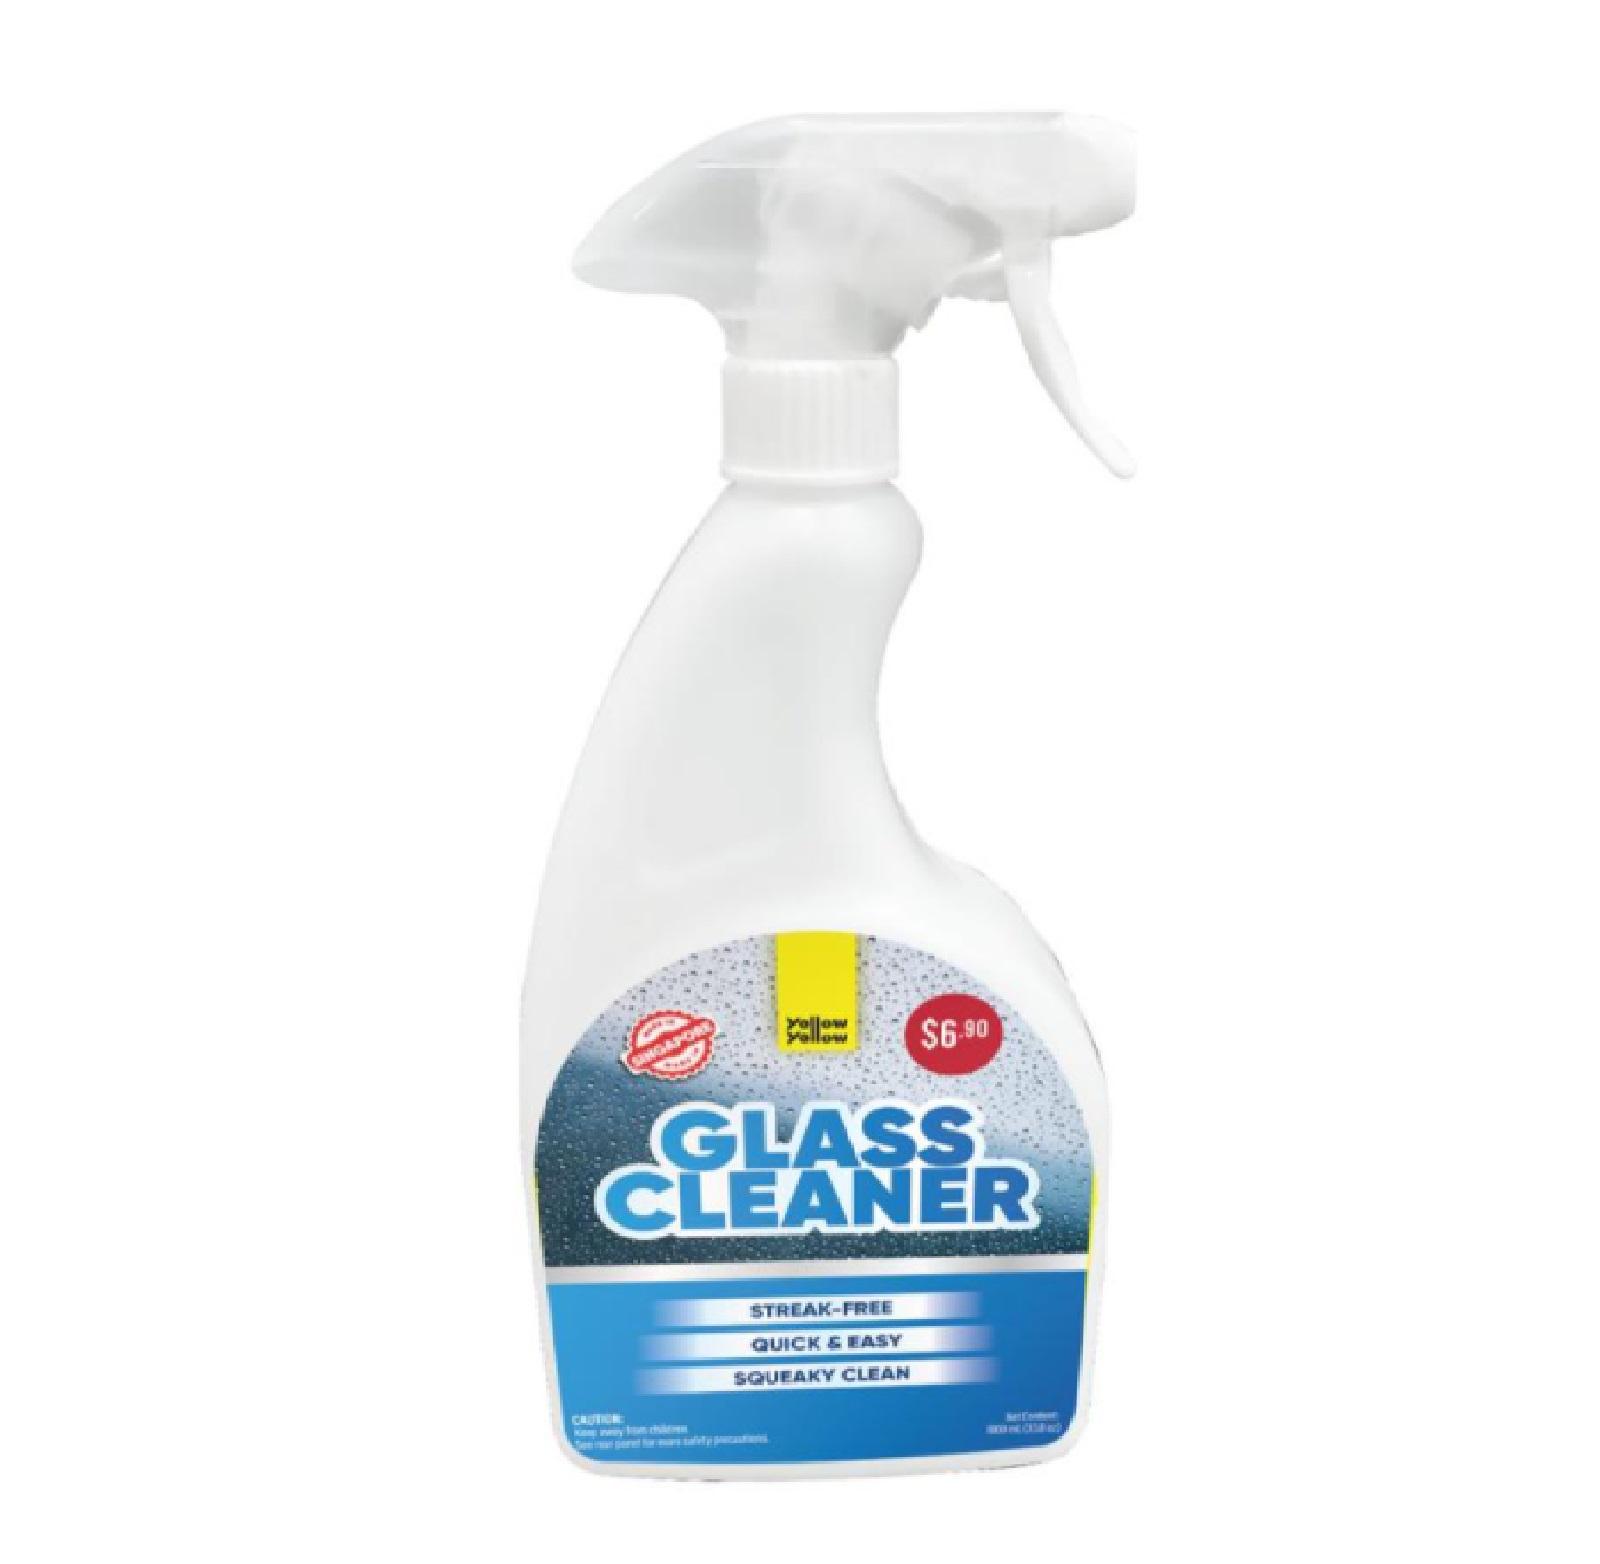 Yellowyellow Streak-Free Glass Cleaner 1L